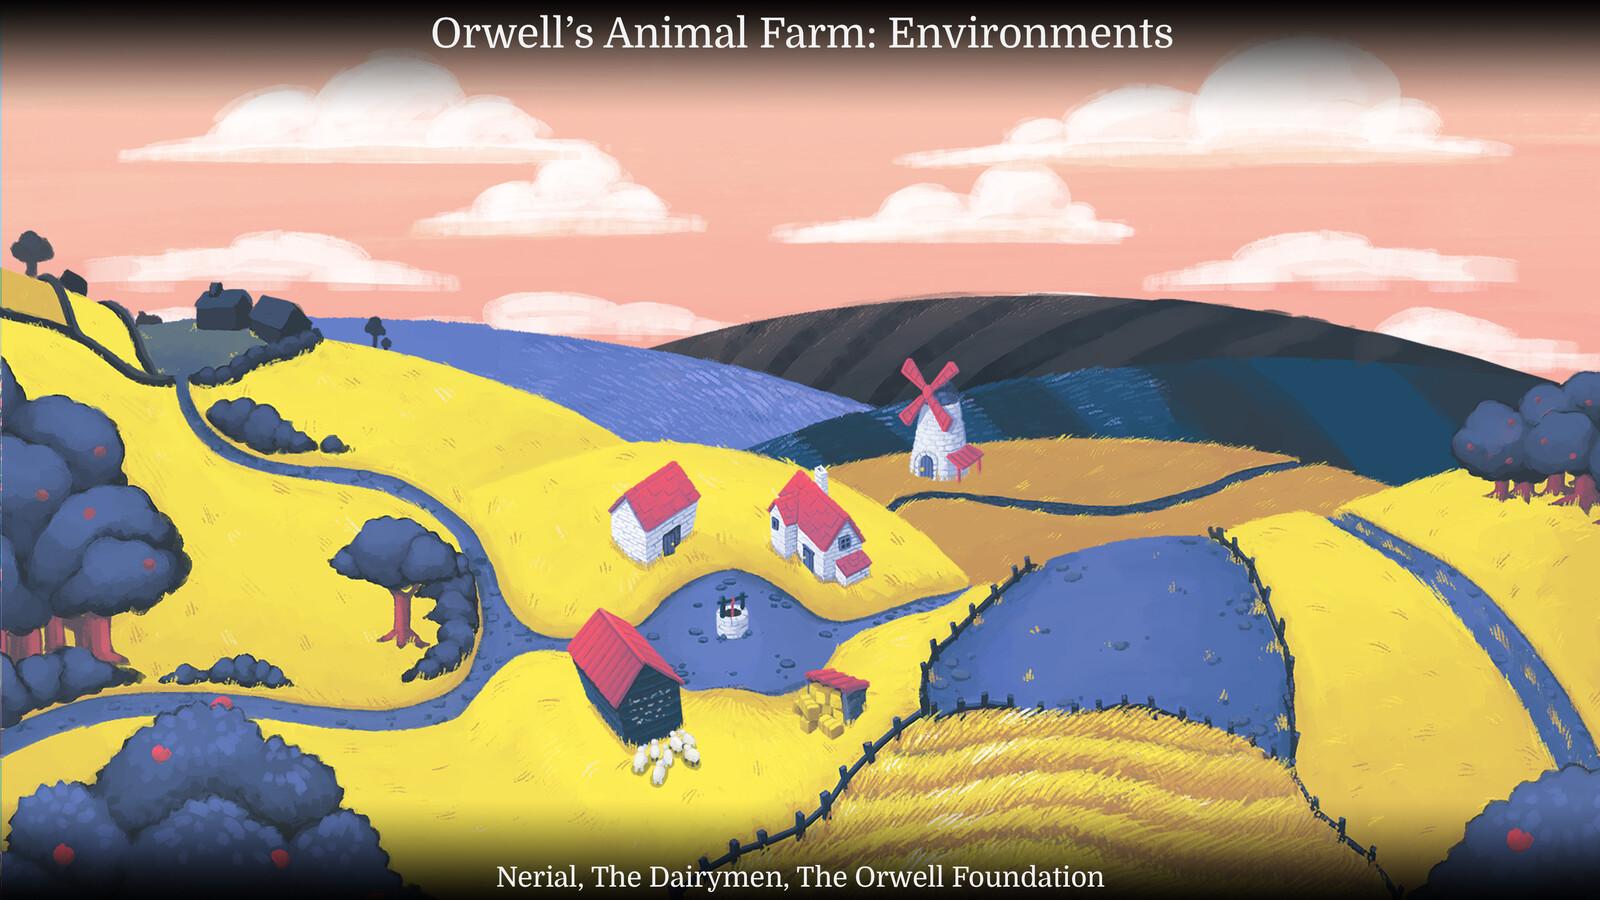 Orwell's Animal Farm: Environments